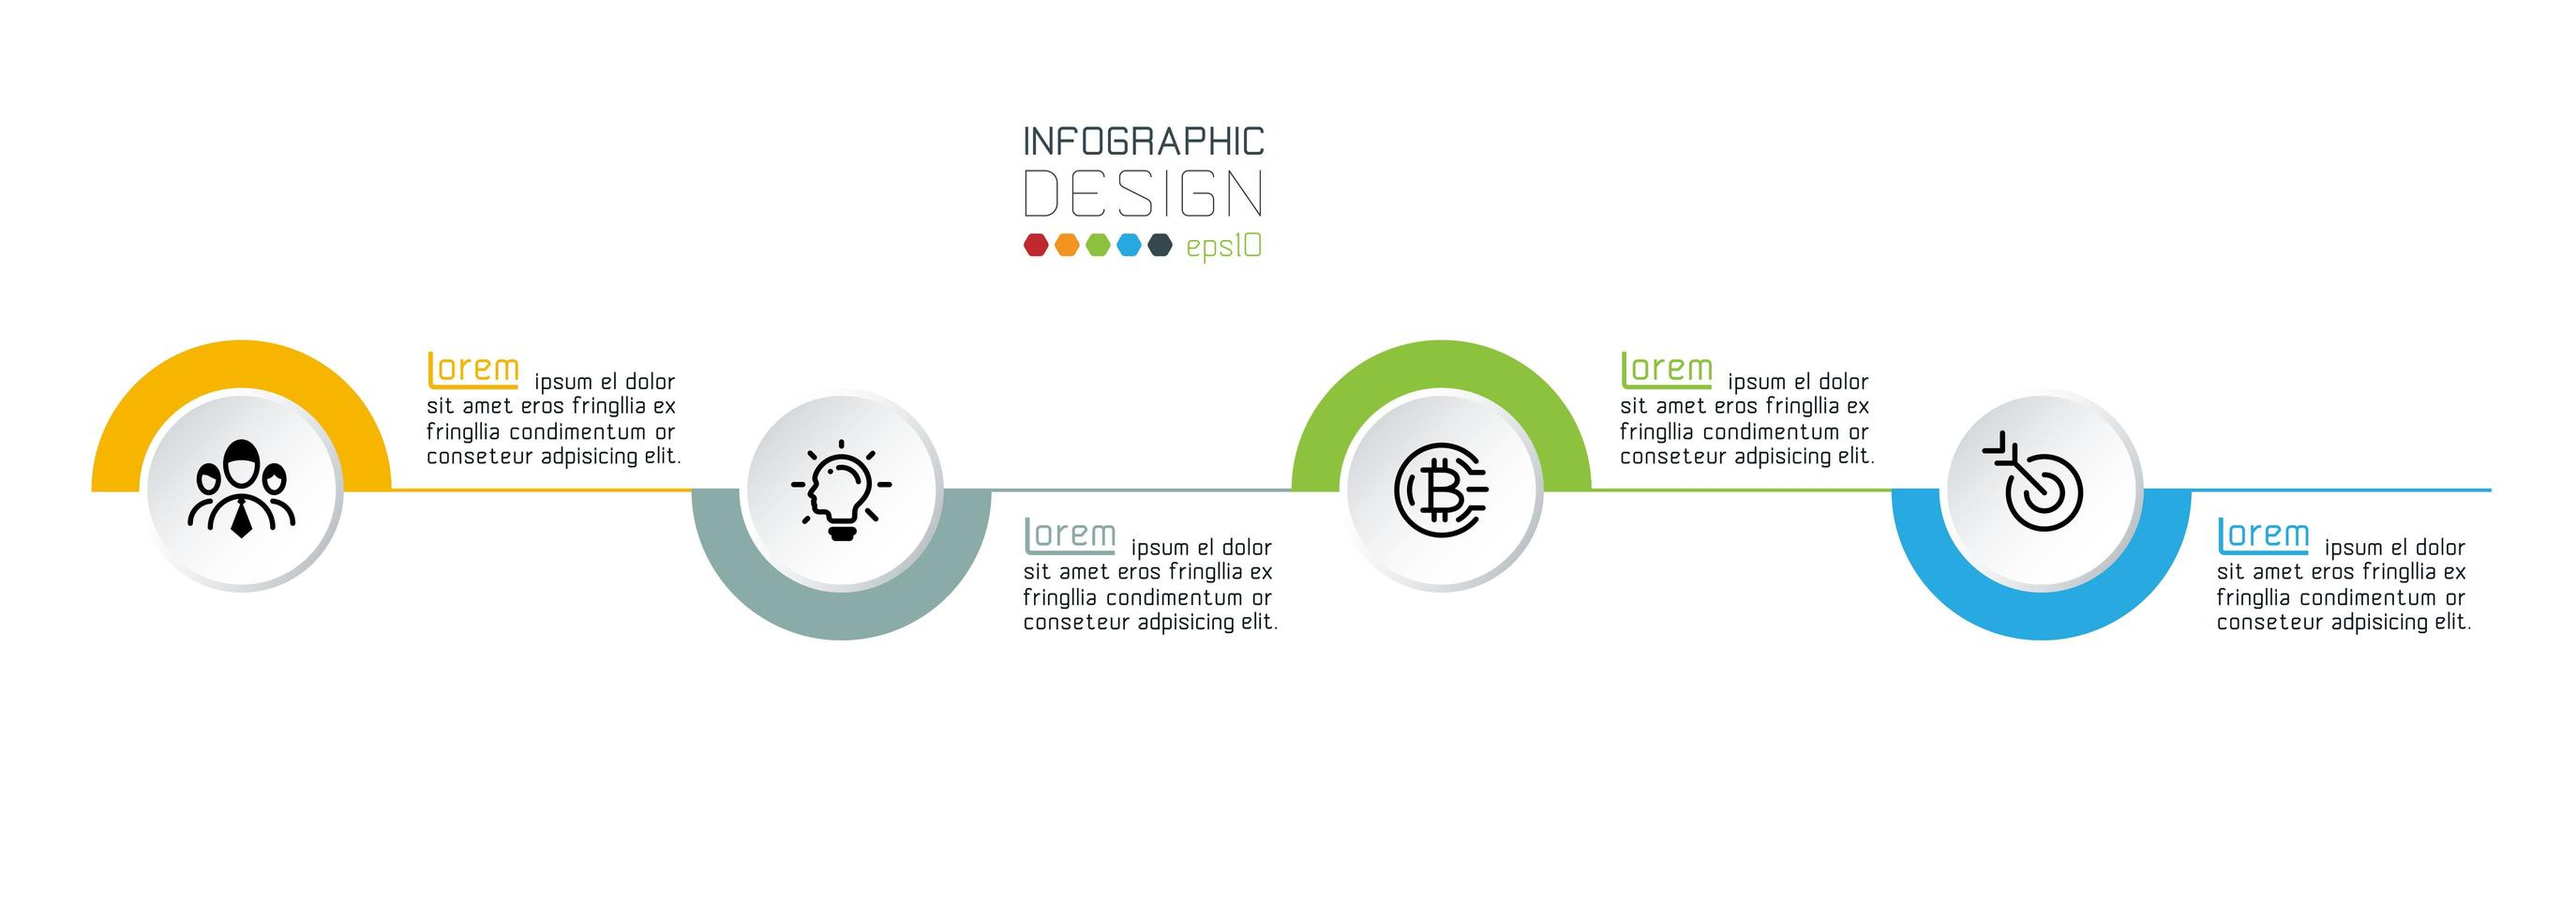 presentación infográfica de medio círculo colorido vector